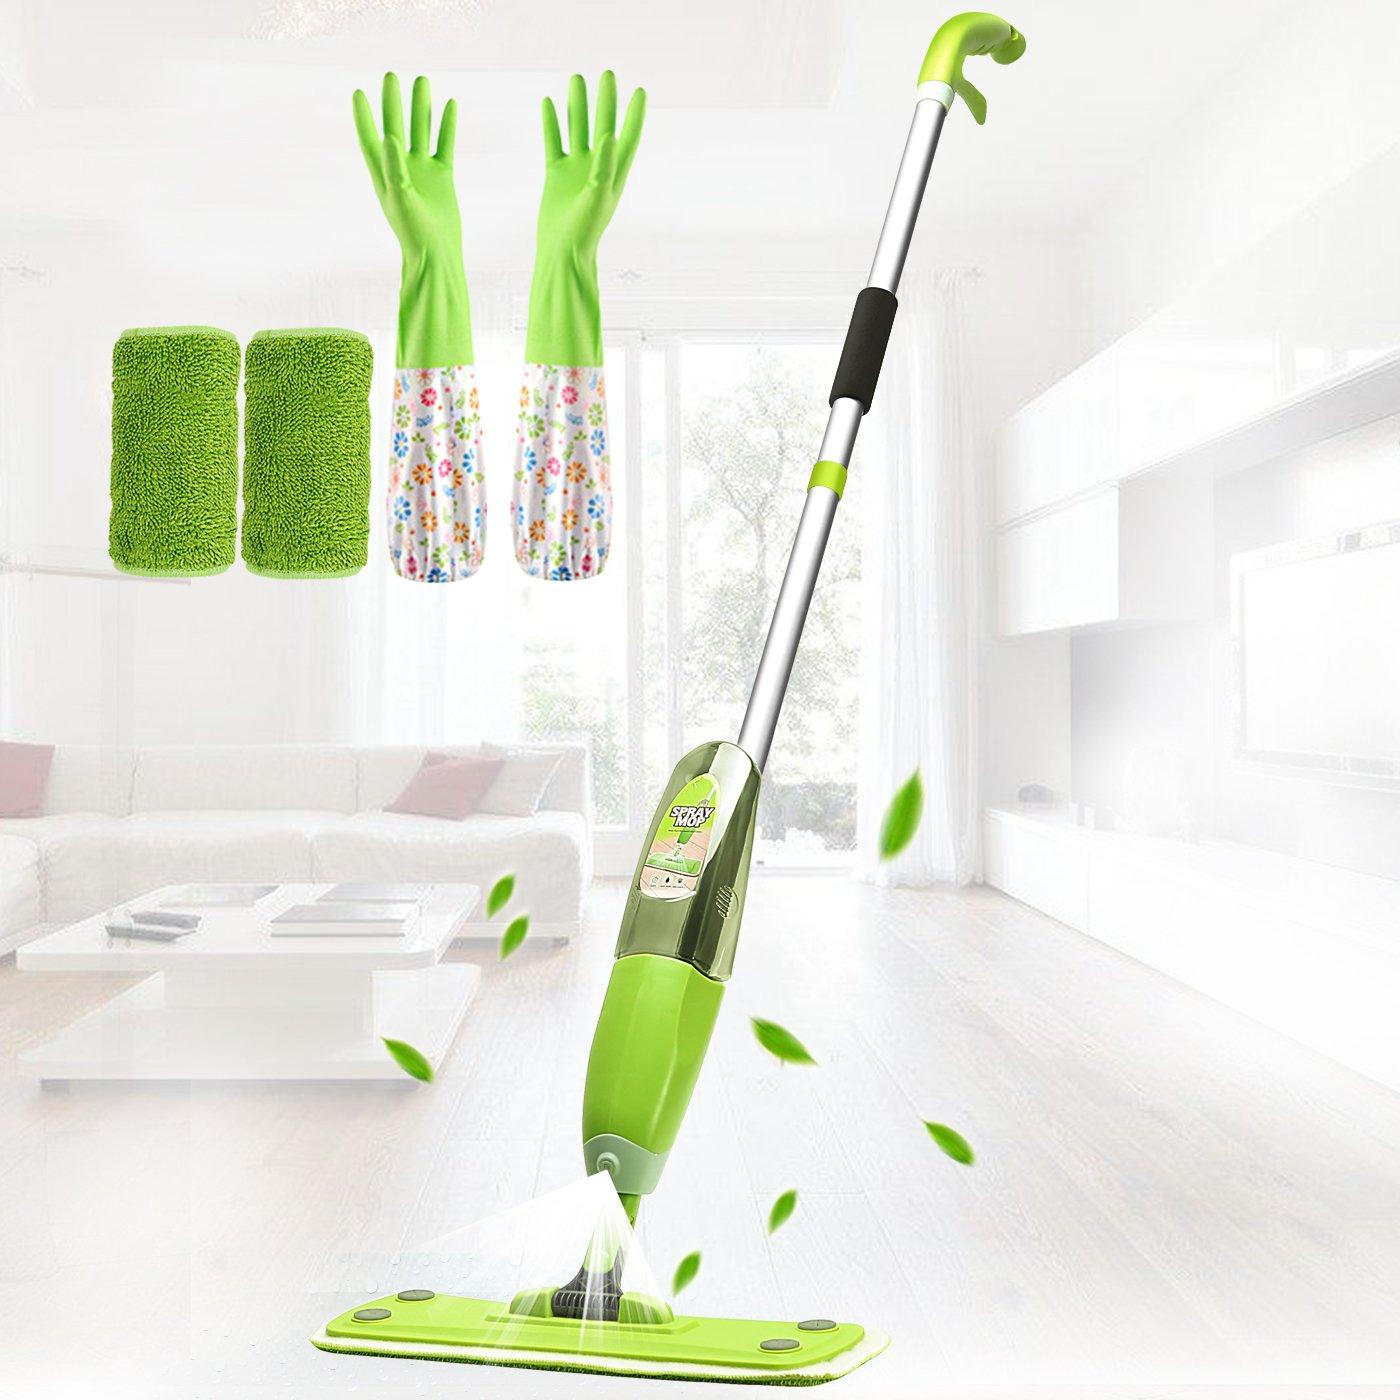 MENQANG Floor Mop,Clean Mop,Floor Spray Mop,Water mop,360 Degree Microfiber Spray Mop Gift (Clean Gloves and Mop Cloth)